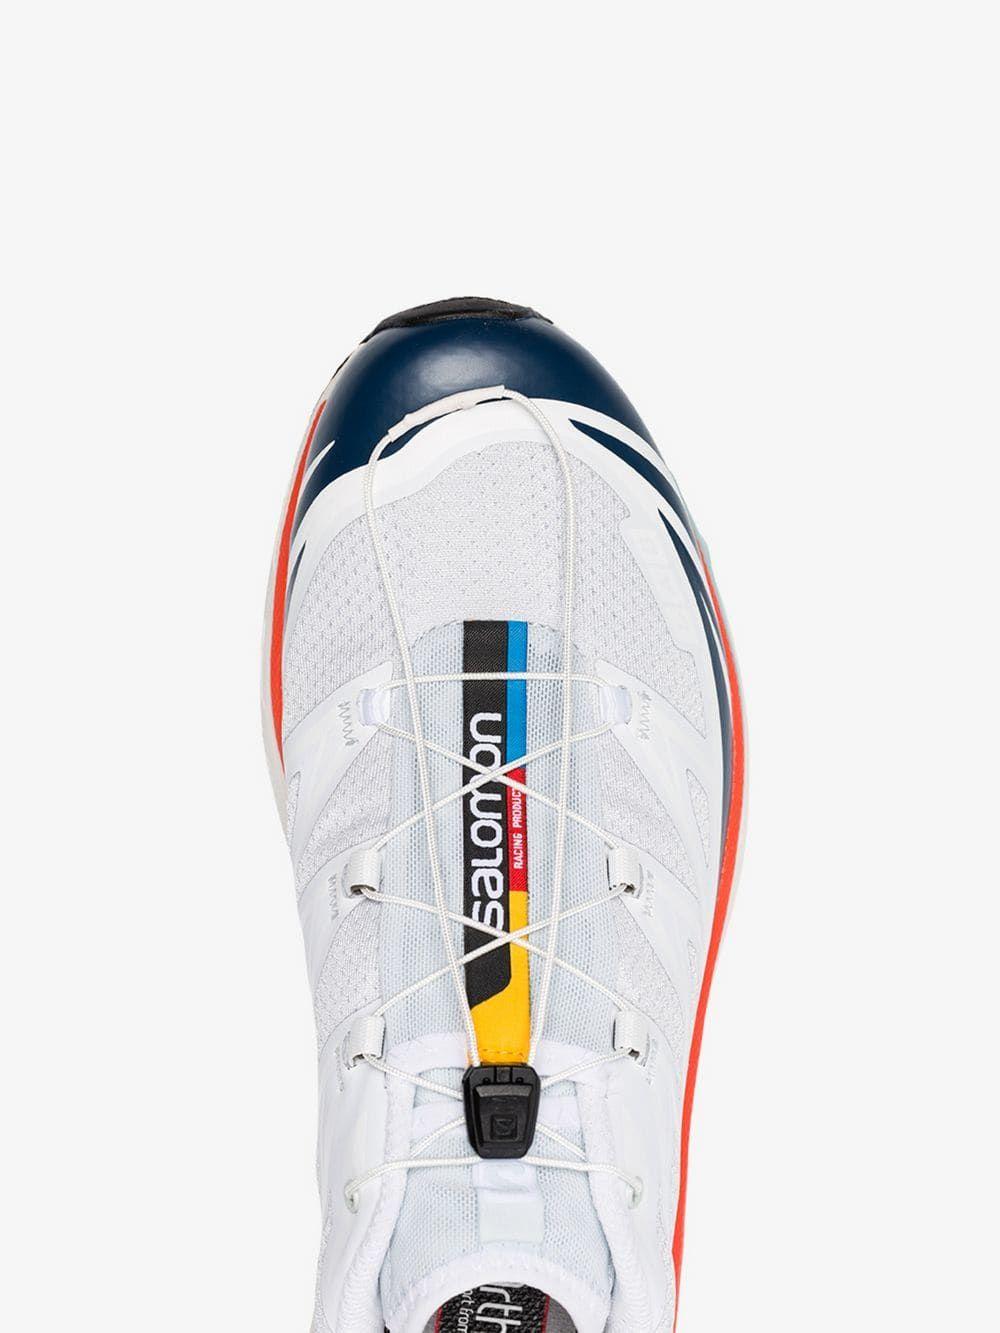 XT 6 ADV Sneakers   URBAN UTILITY URBAN LUXURY   Sneakers